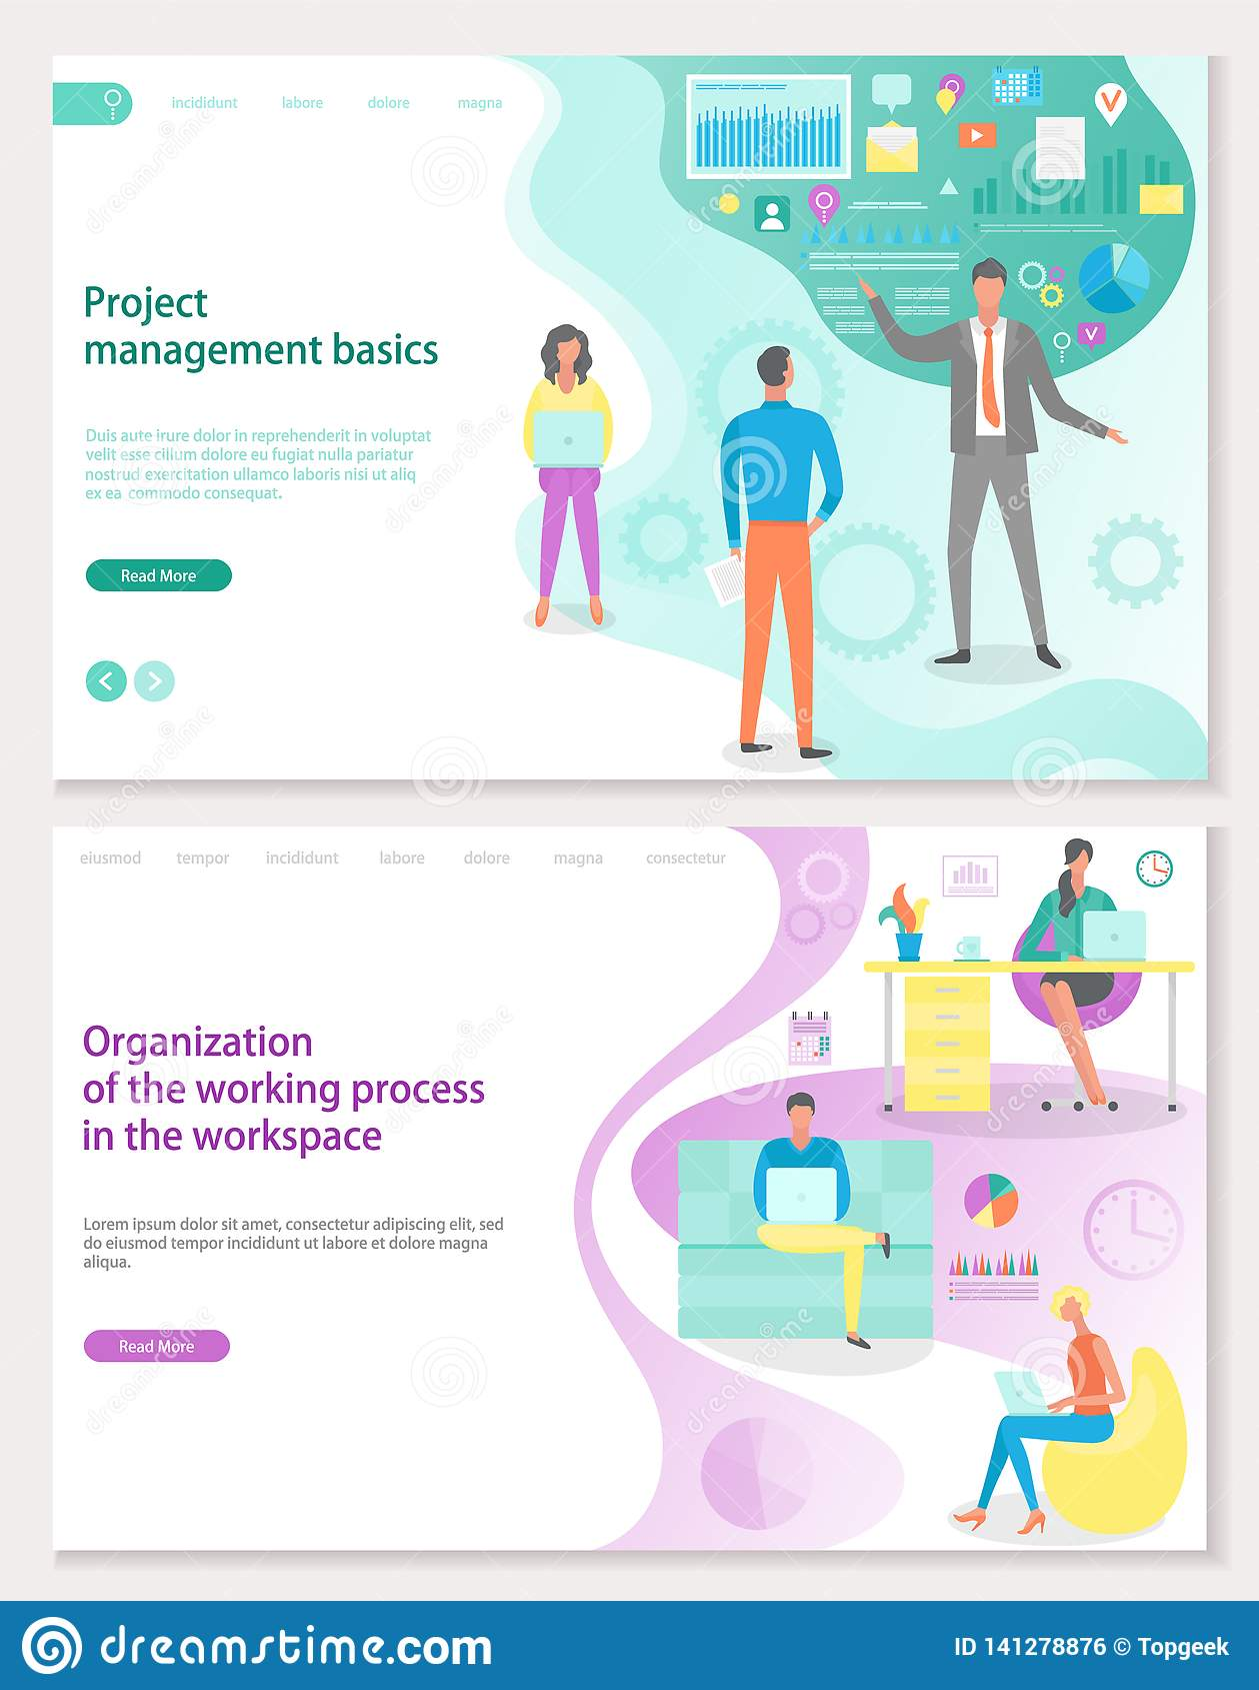 Project Management Basics, Workplace Organization